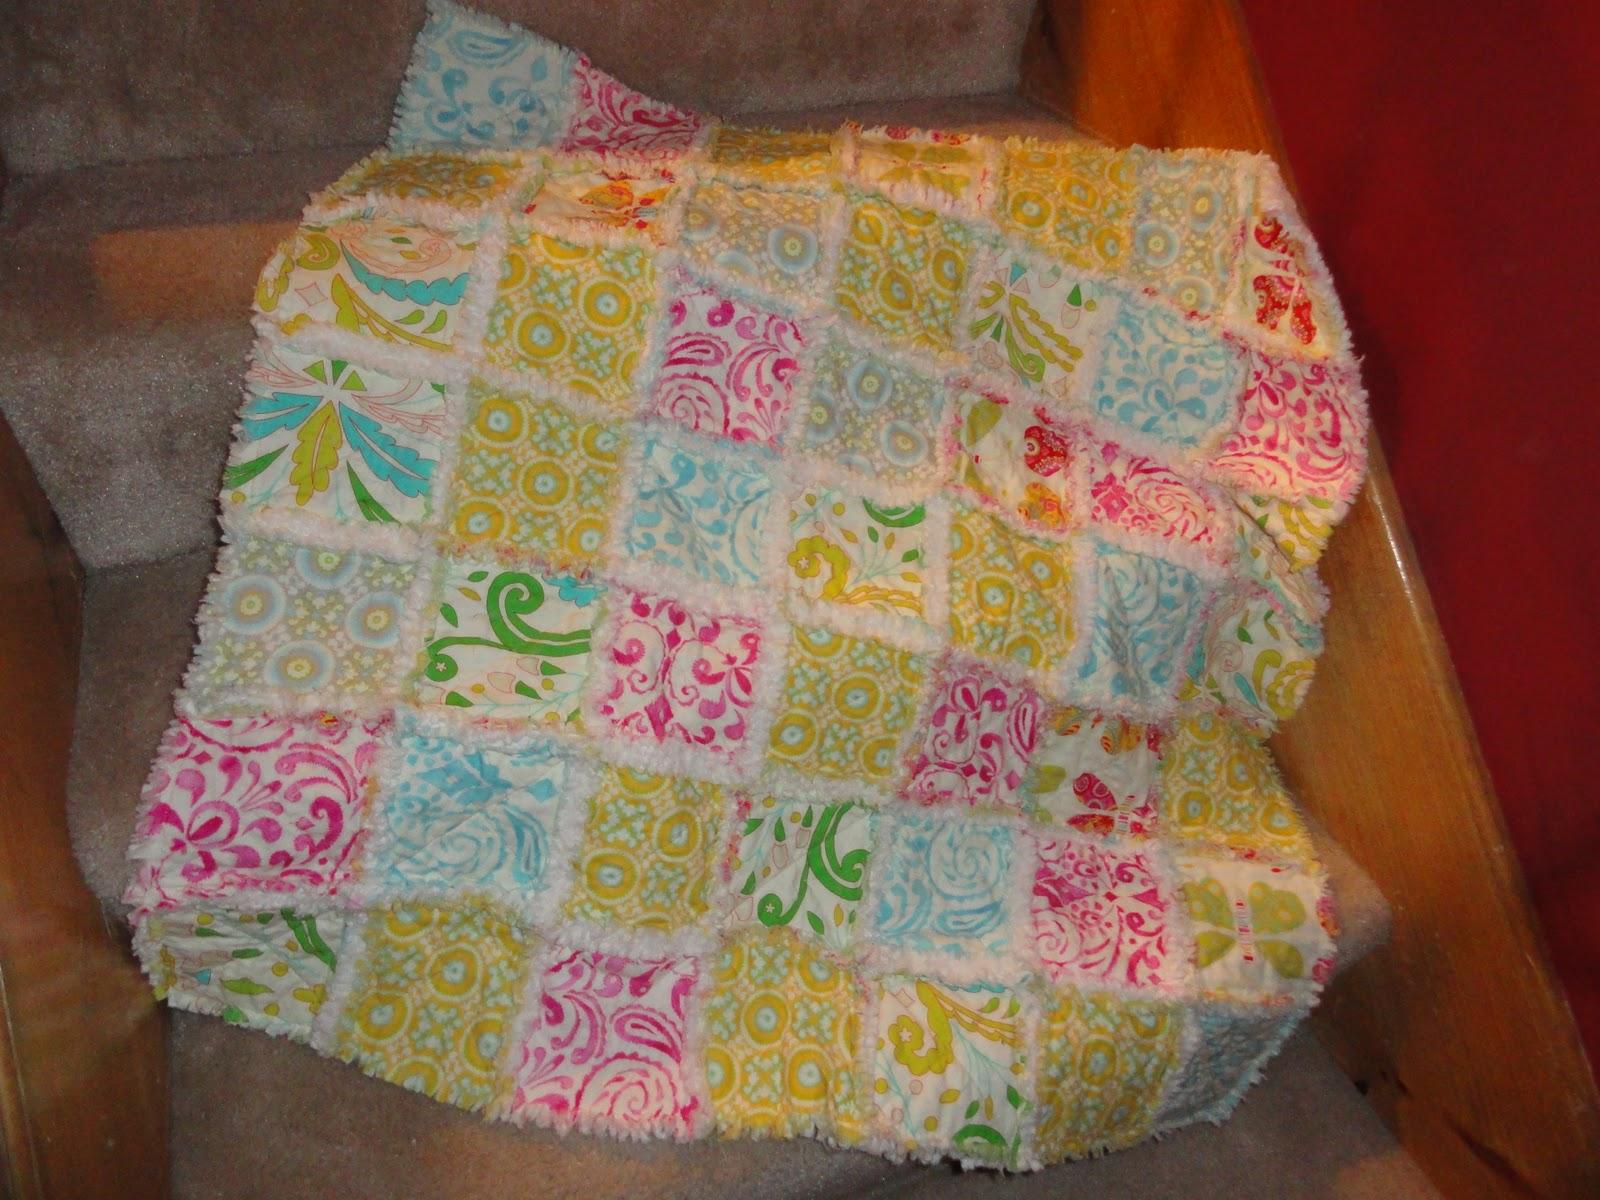 Oxford impressions rag quilt using kumari garden by dena for Dena designs kumari garden